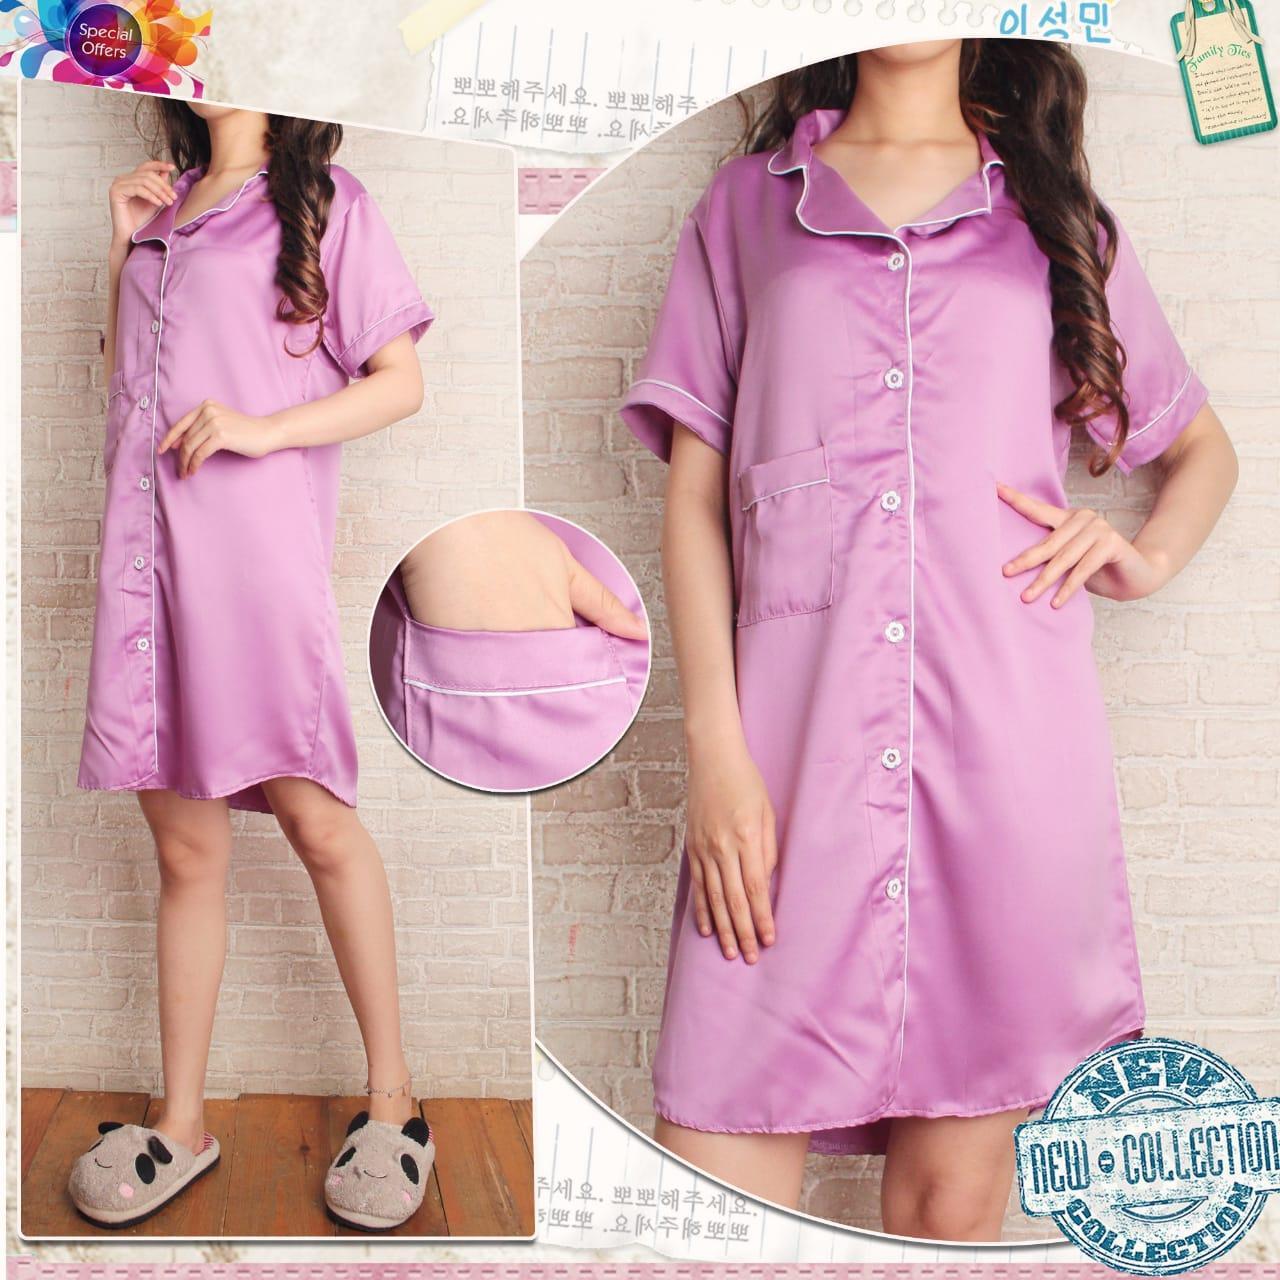 Daster Satin Velvet Silky Piyama Rok Baju Tidur SleepWear Pajamas wanita dewasa